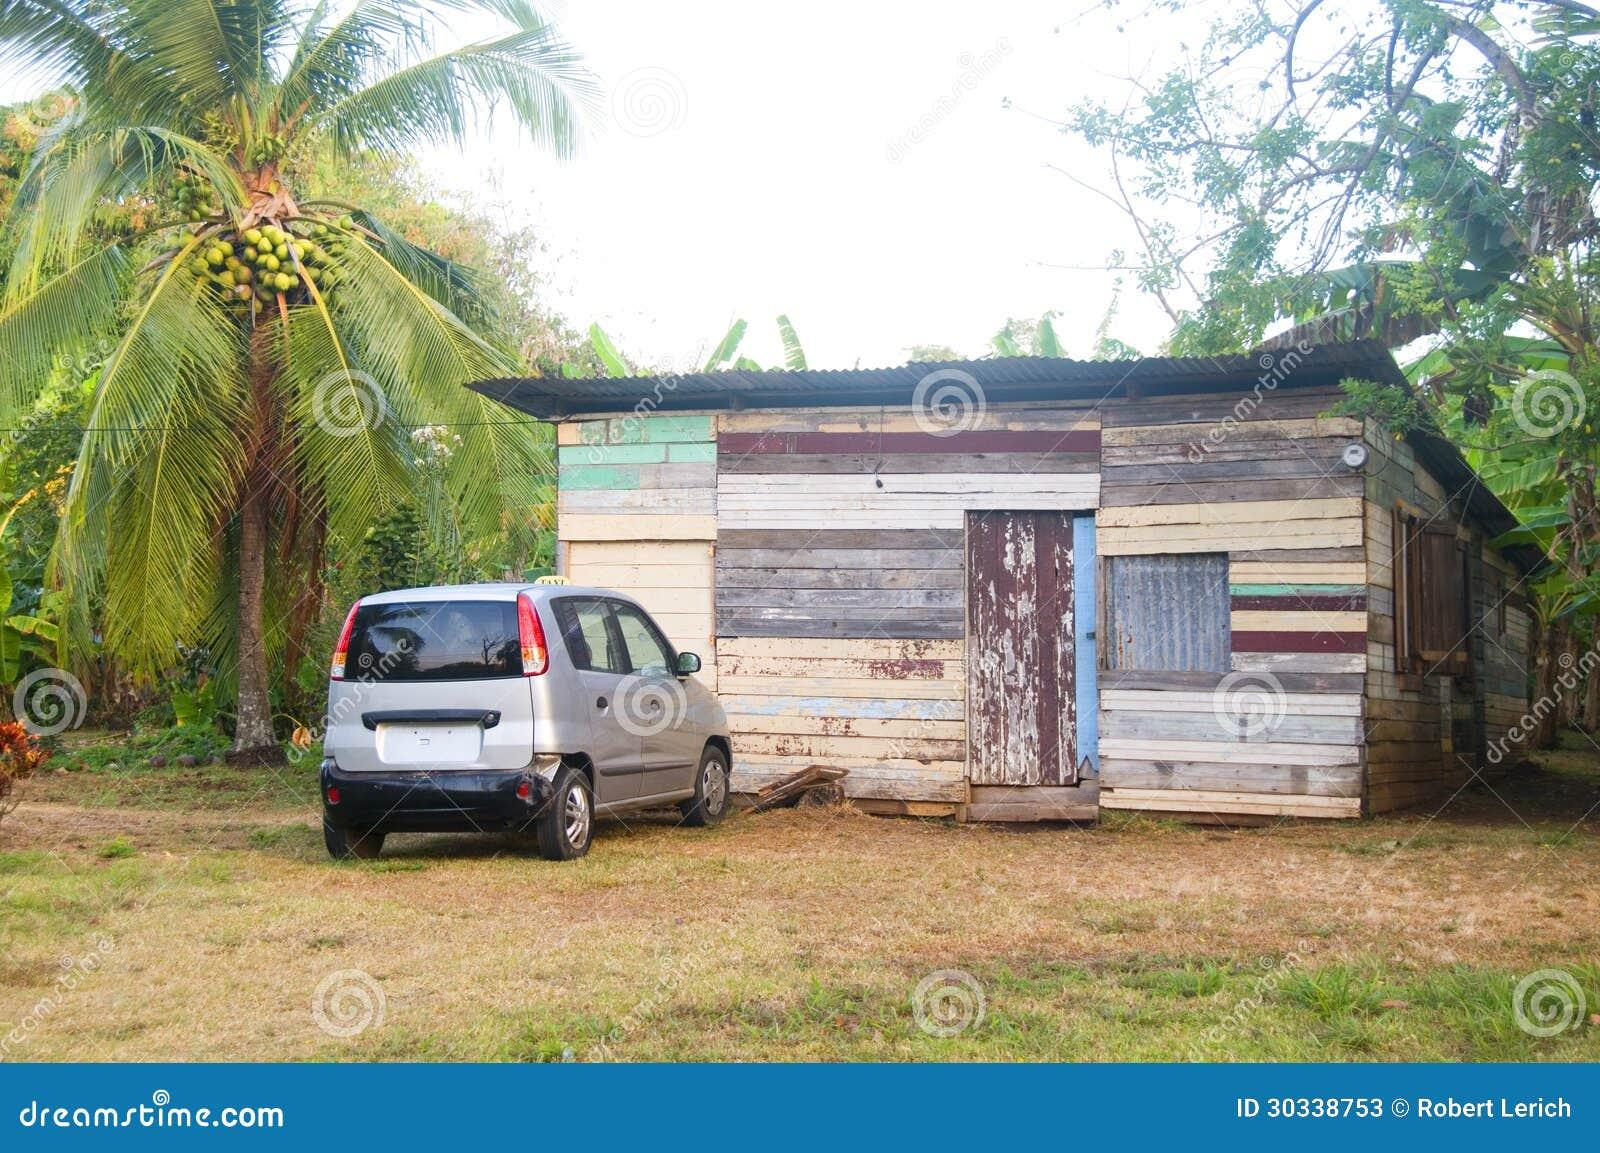 Casa de madera nicarag ense nativa t pica de la tablilla for Casas con tablillas